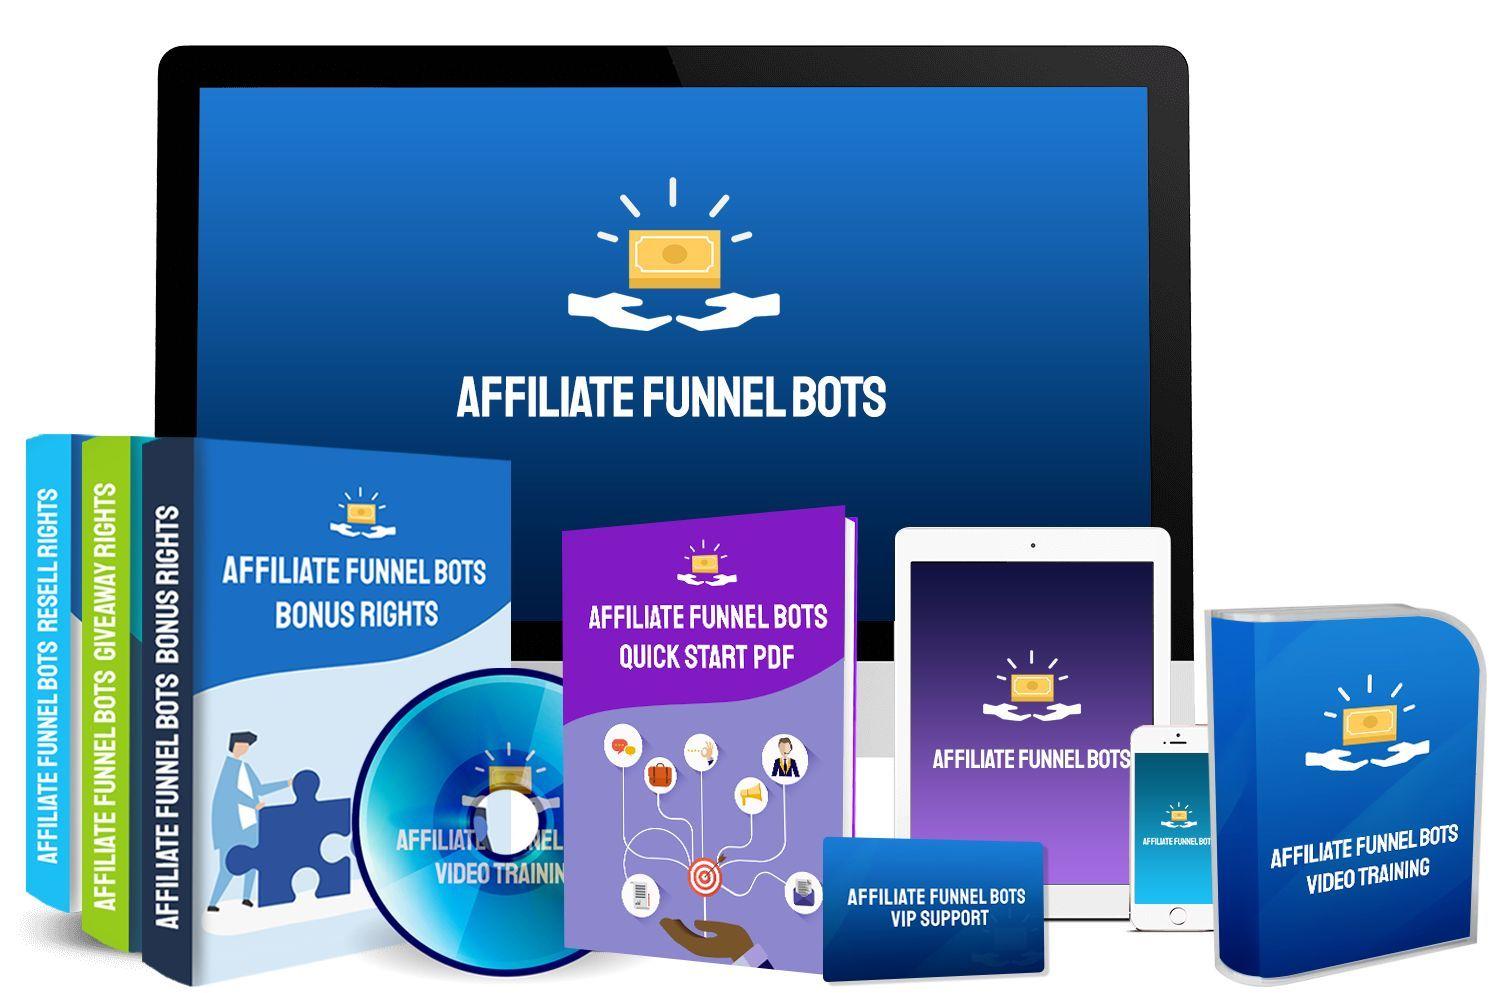 Affiliate Funnel Bots Software apps, Marketing software